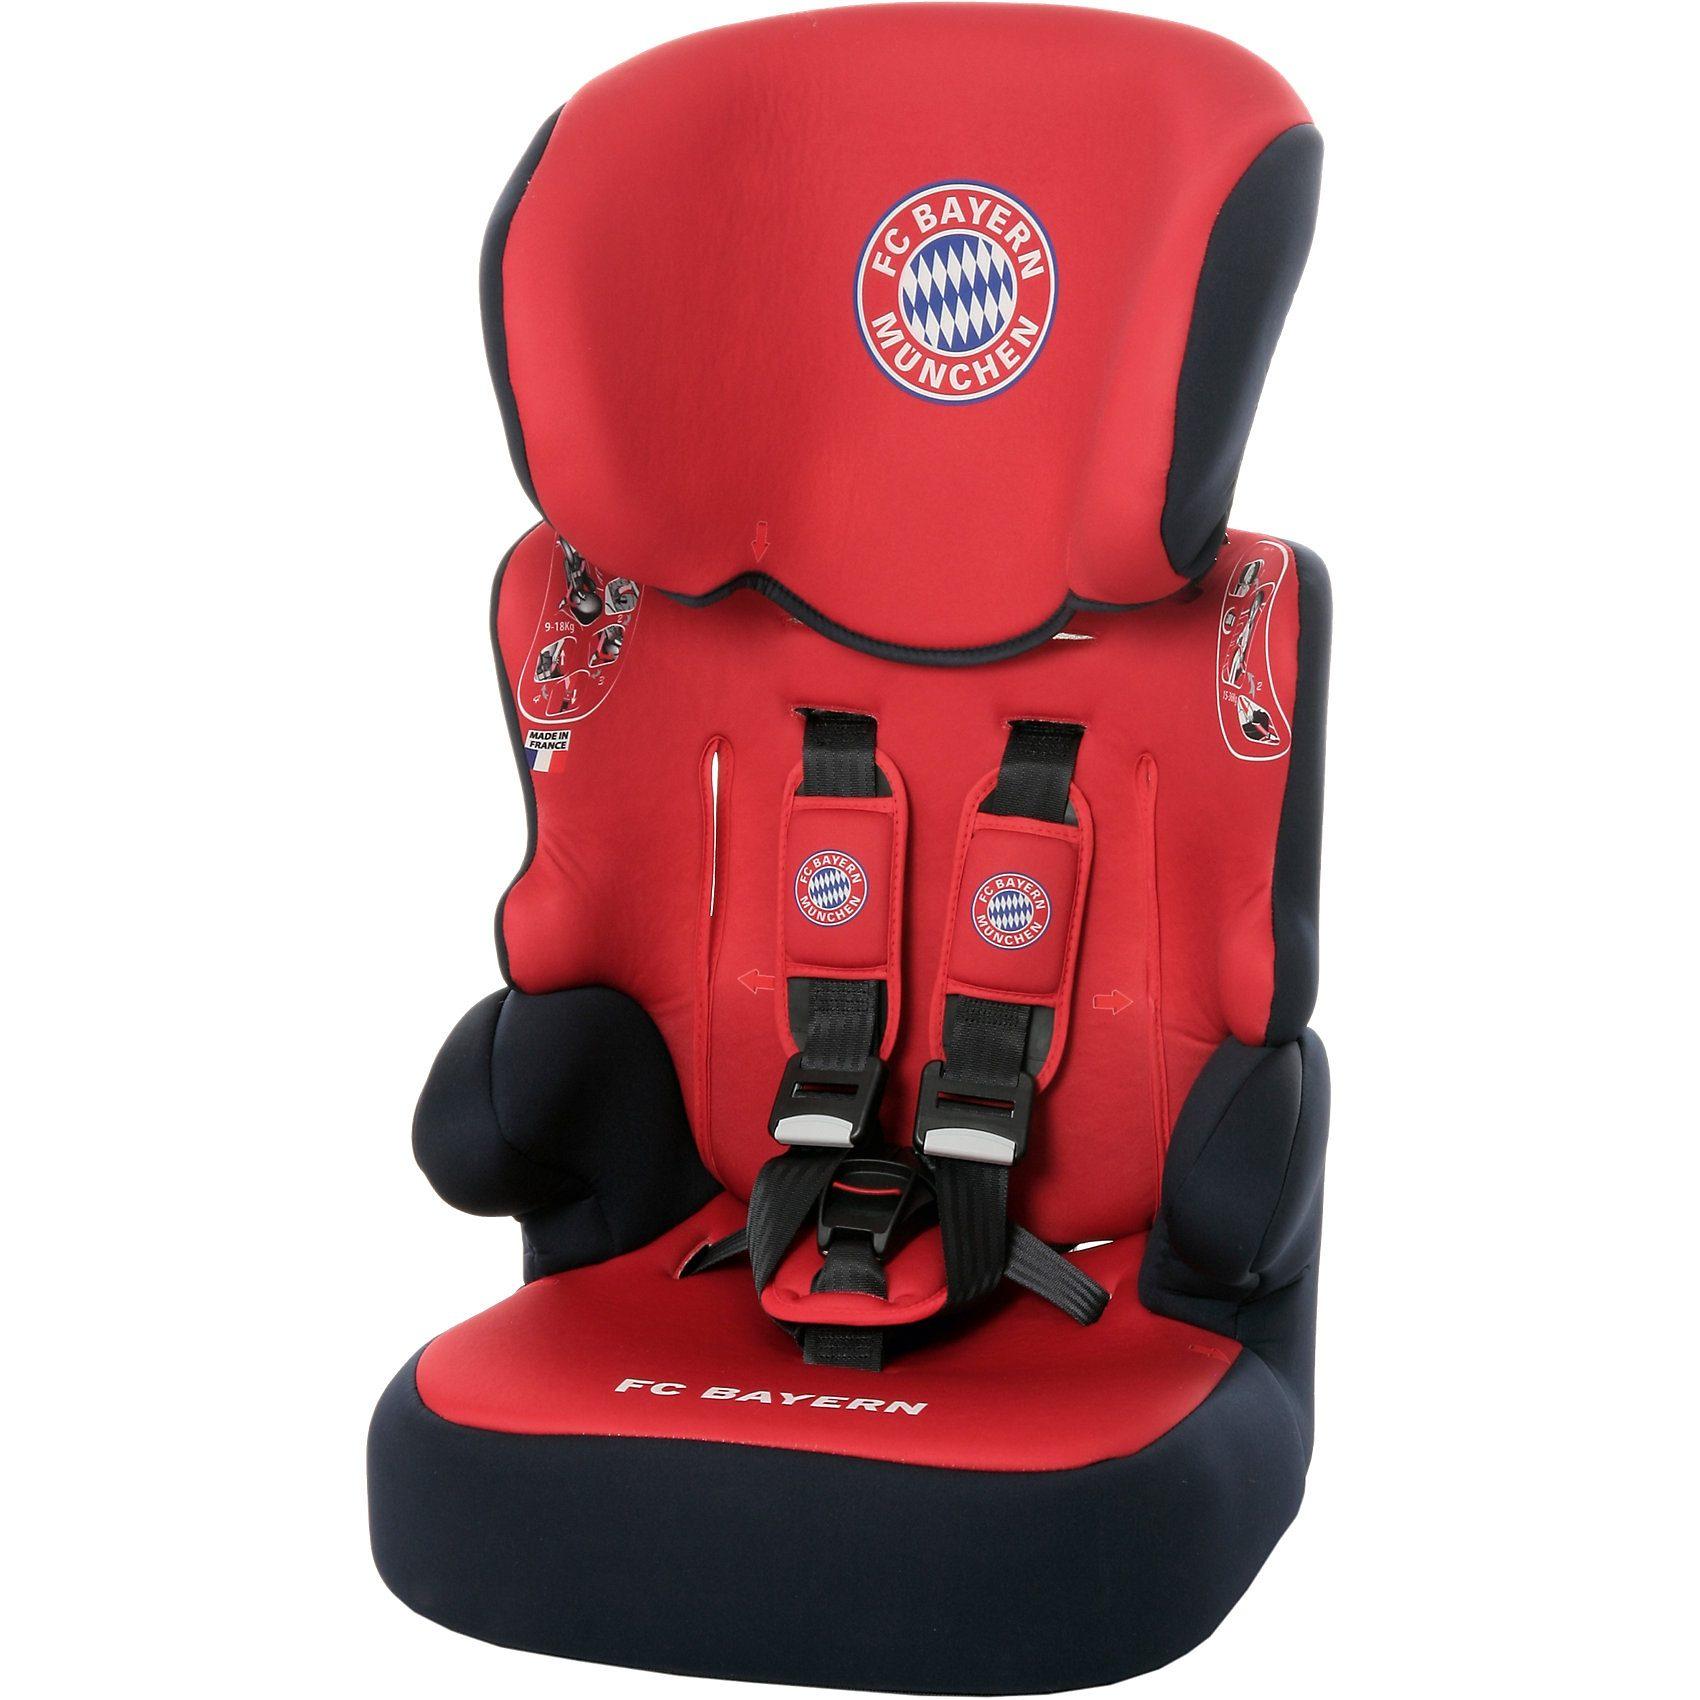 Osann Auto-Kindersitz Colorado, FC Bayern München, 2017